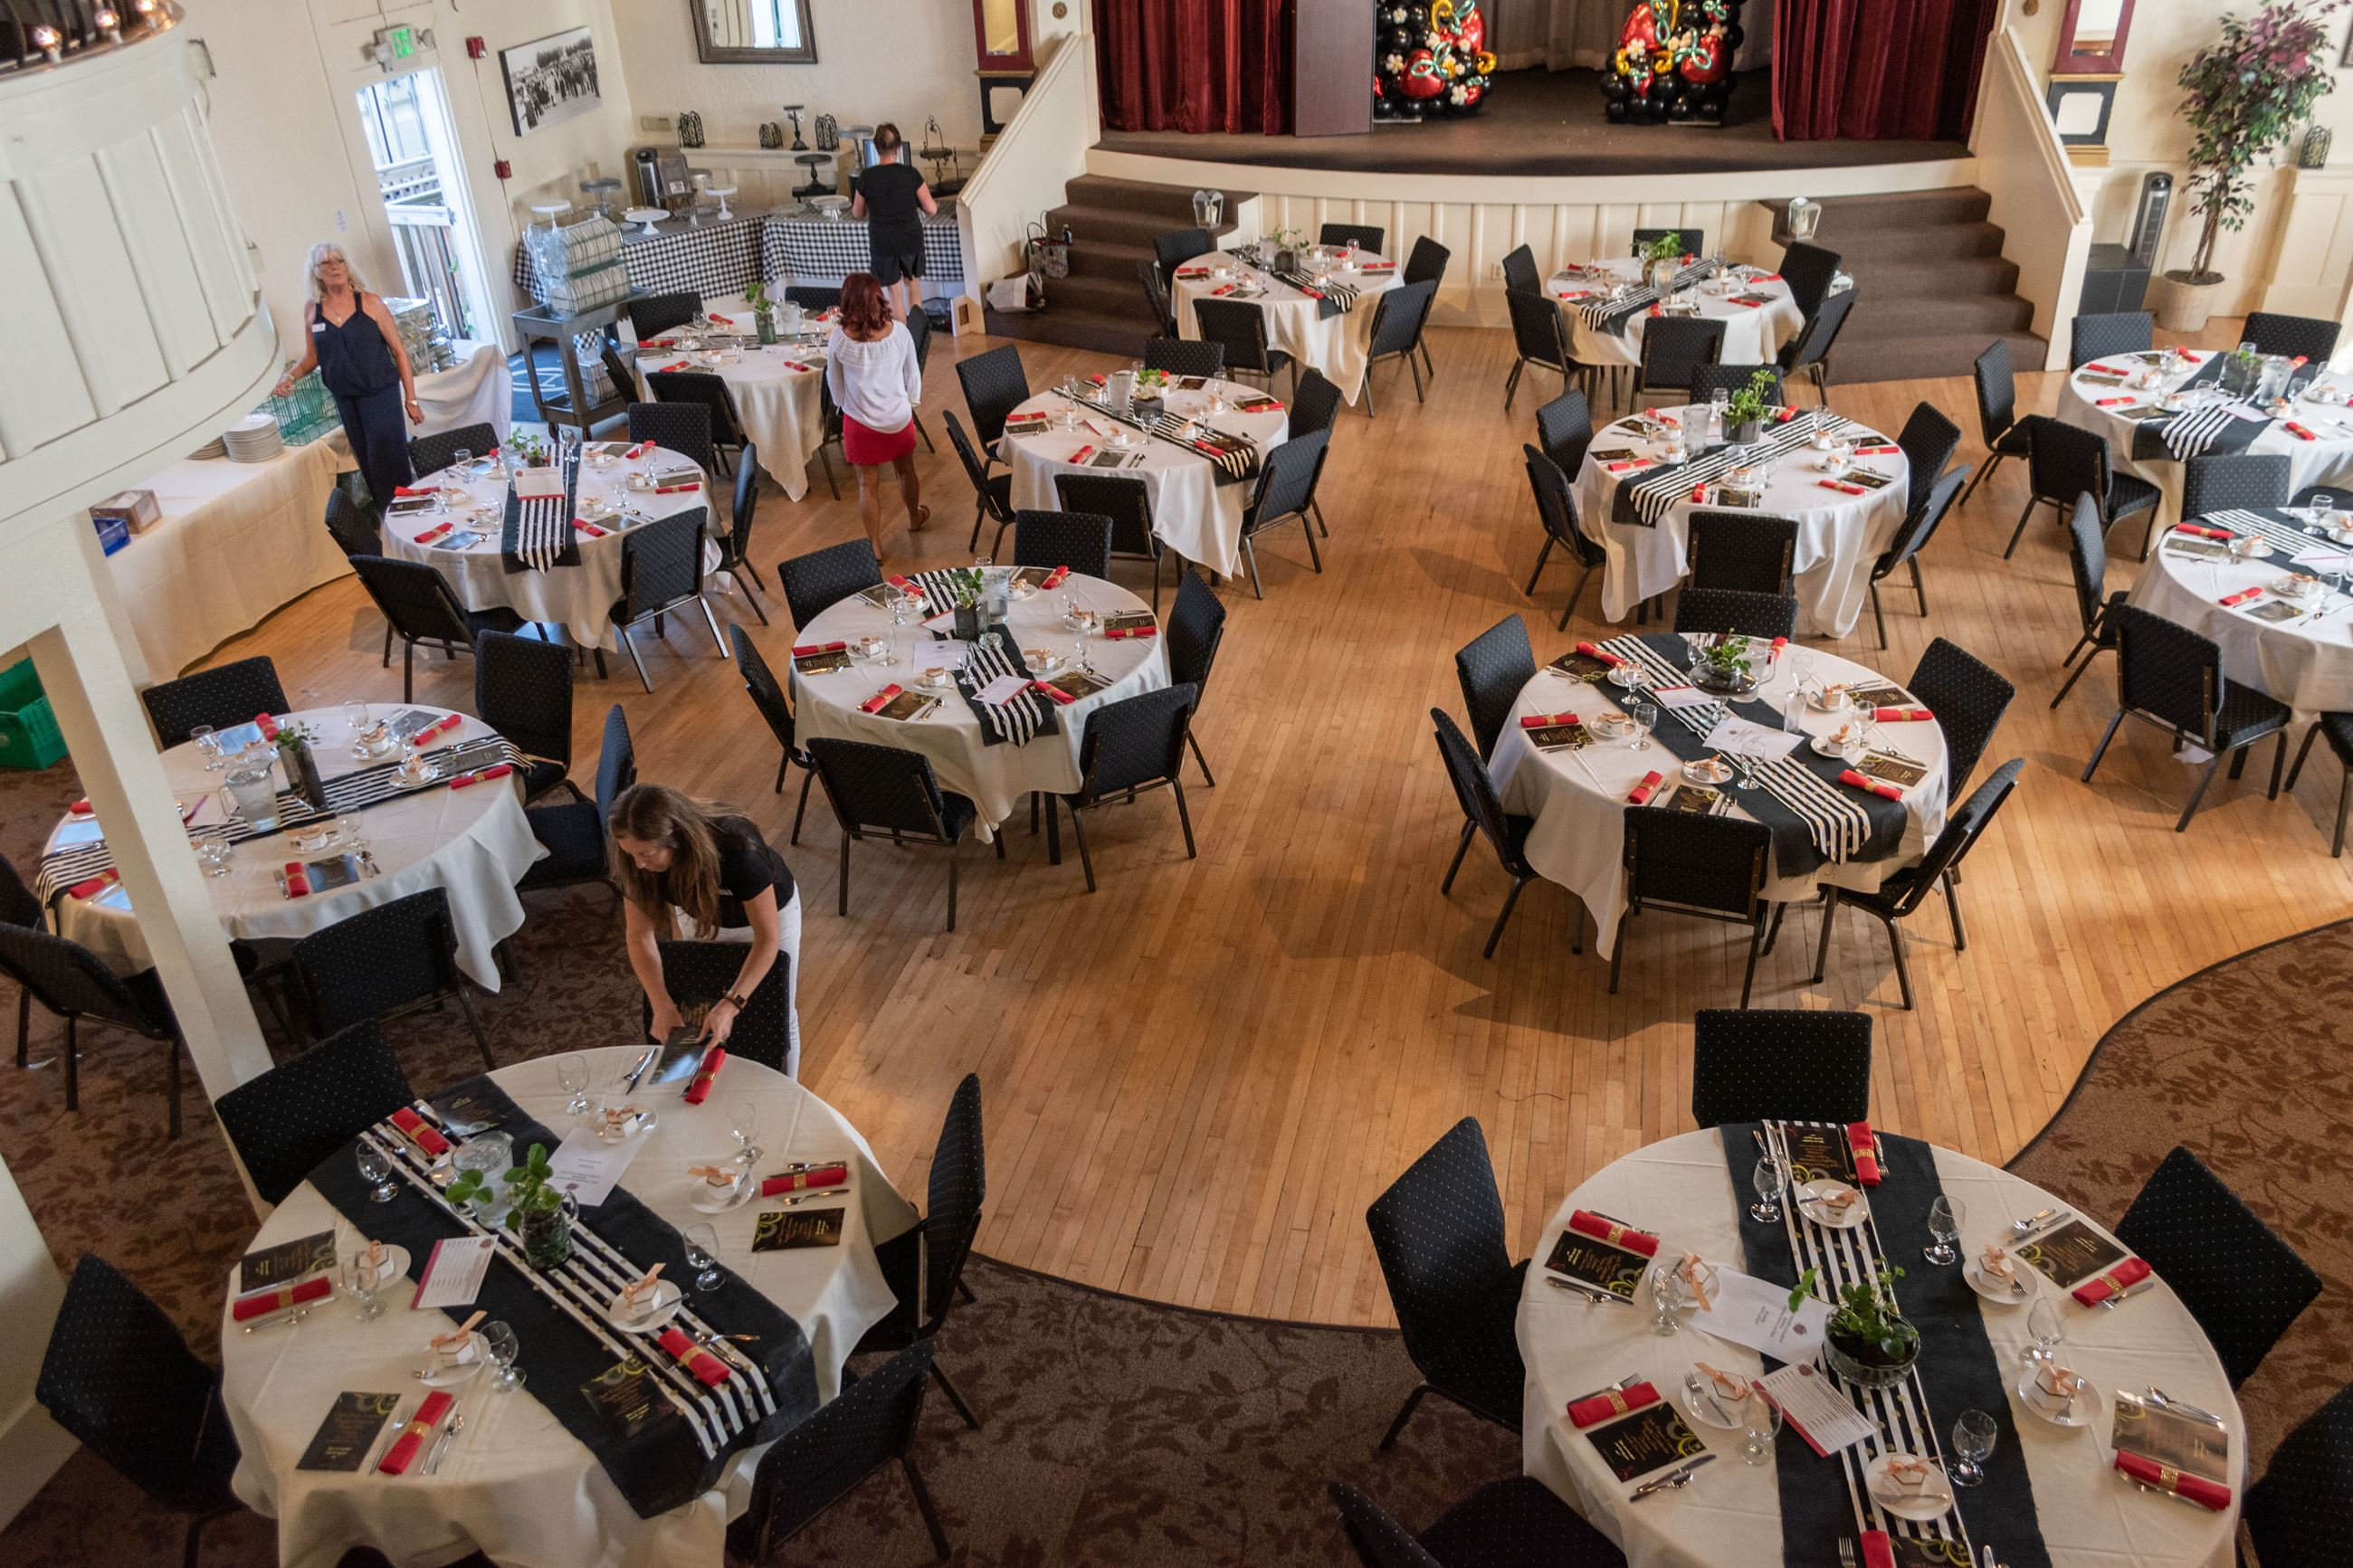 Round Table Marysville.Opera House Rental Information Marysville Wa Official Website